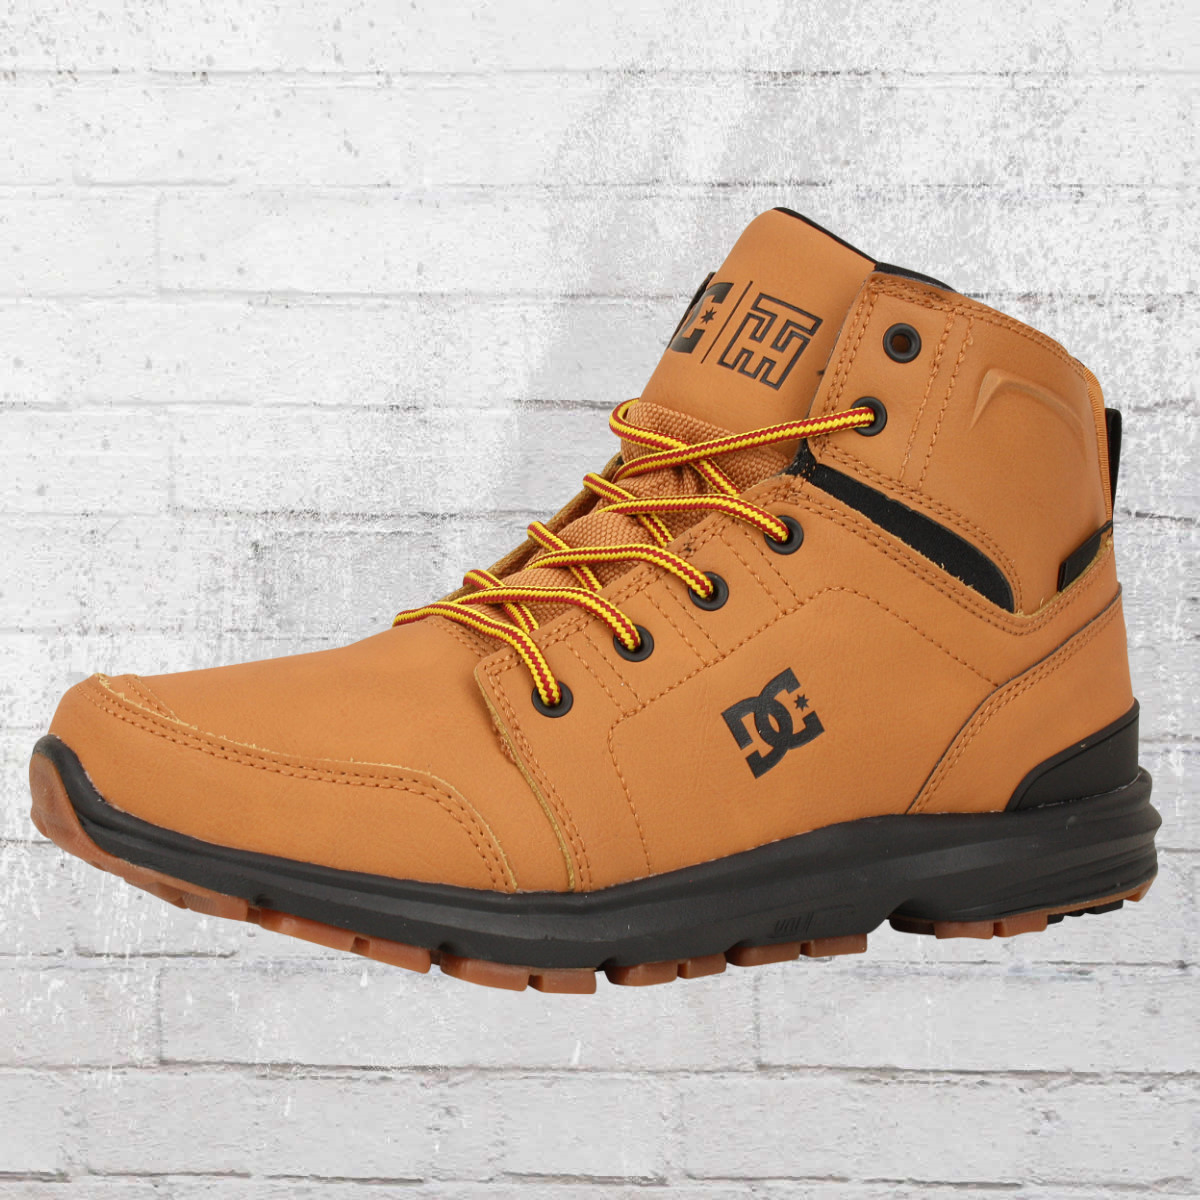 super popular 67b14 5f4aa Jetzt bestellen | DC Shoes Herren Herbst Winter Schuhe ...